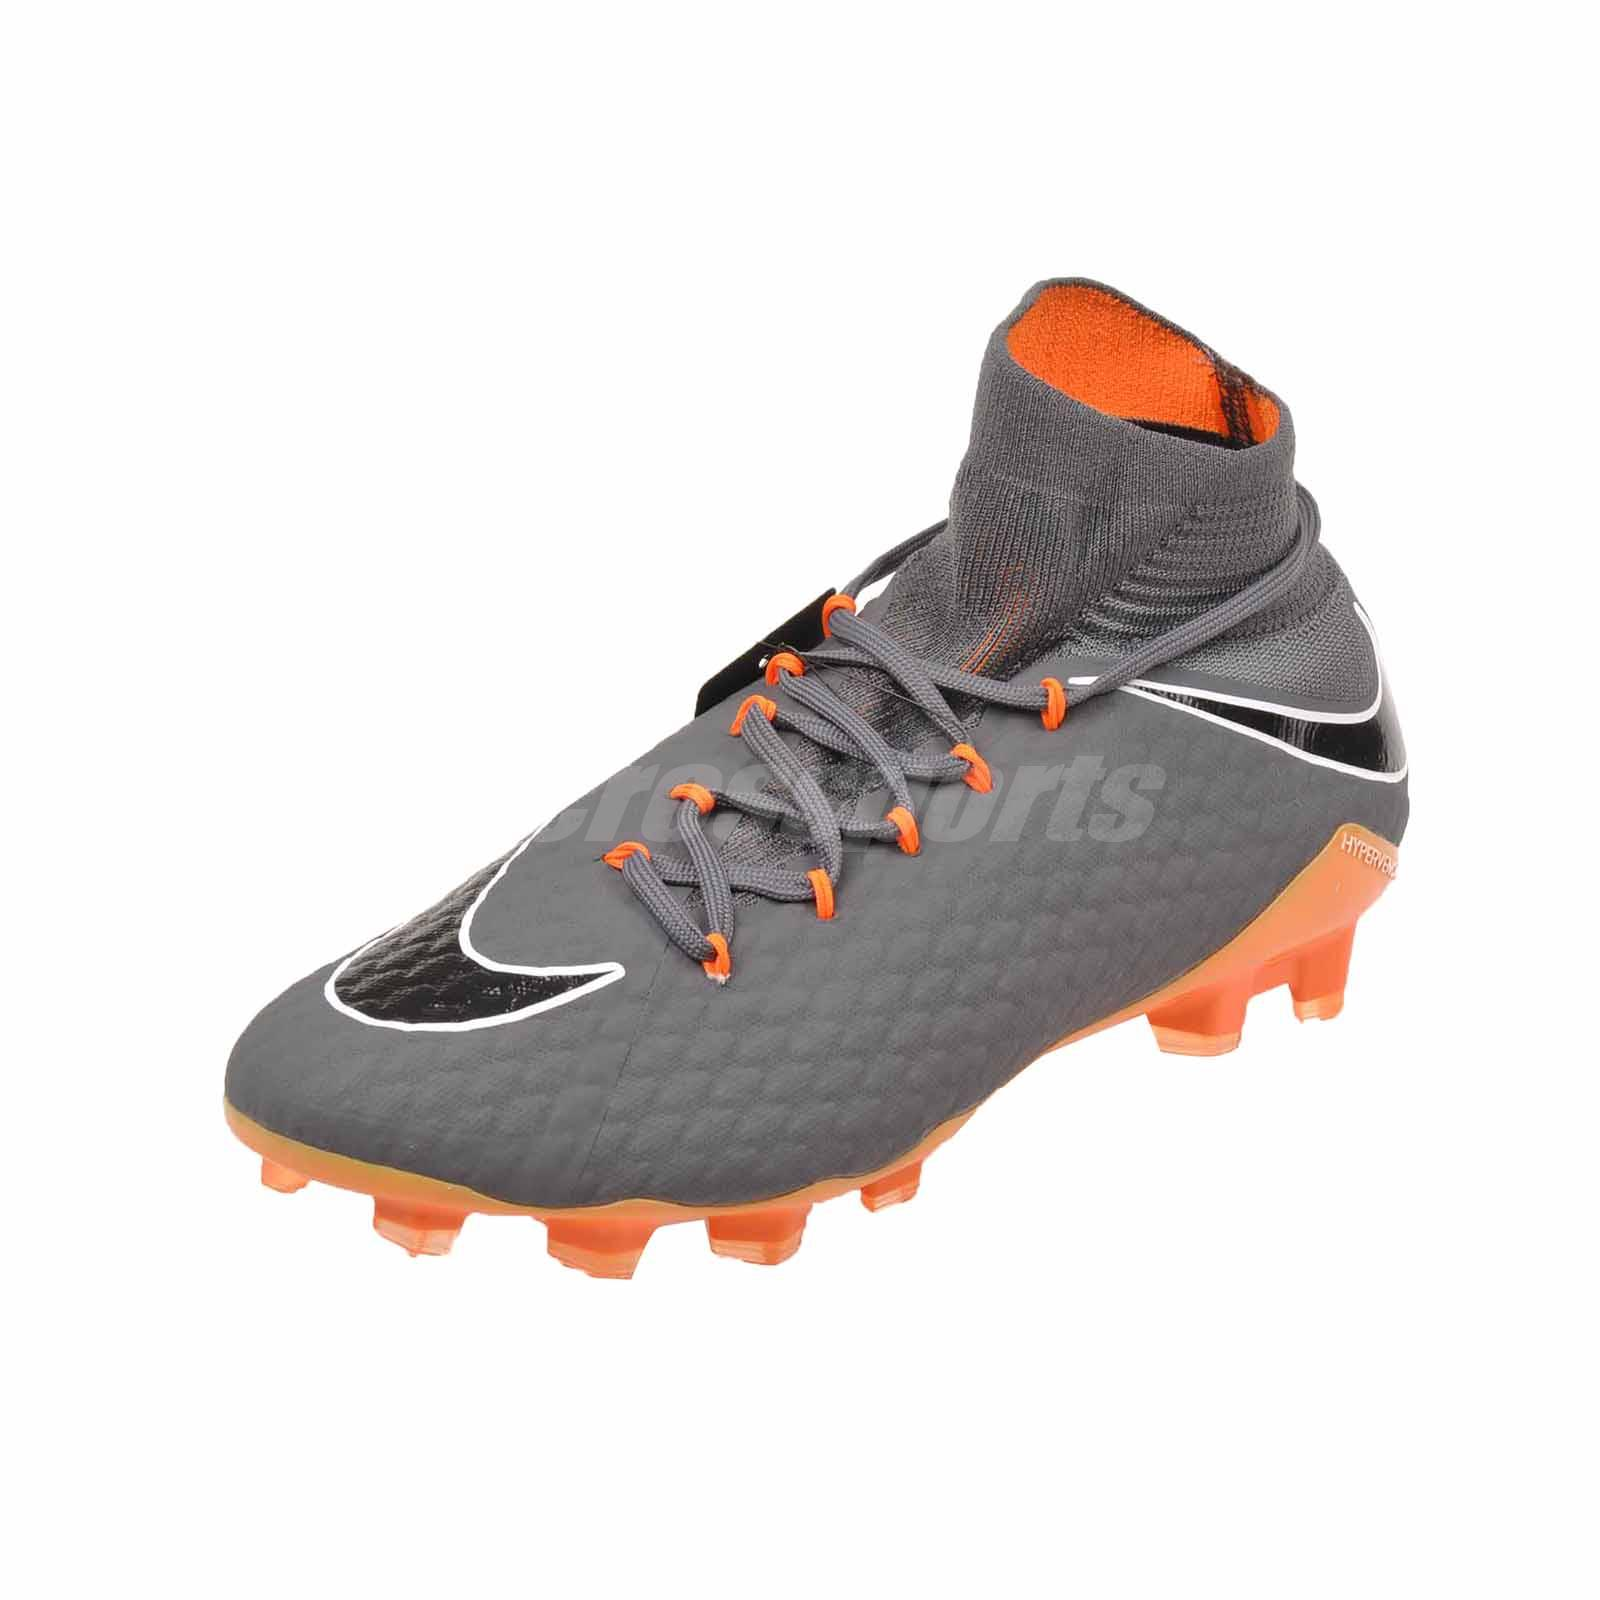 Nike Phantom 3 Pro DF FG Soccer Mens Shoes Dark Grey AH7275-081  f0c50ed70